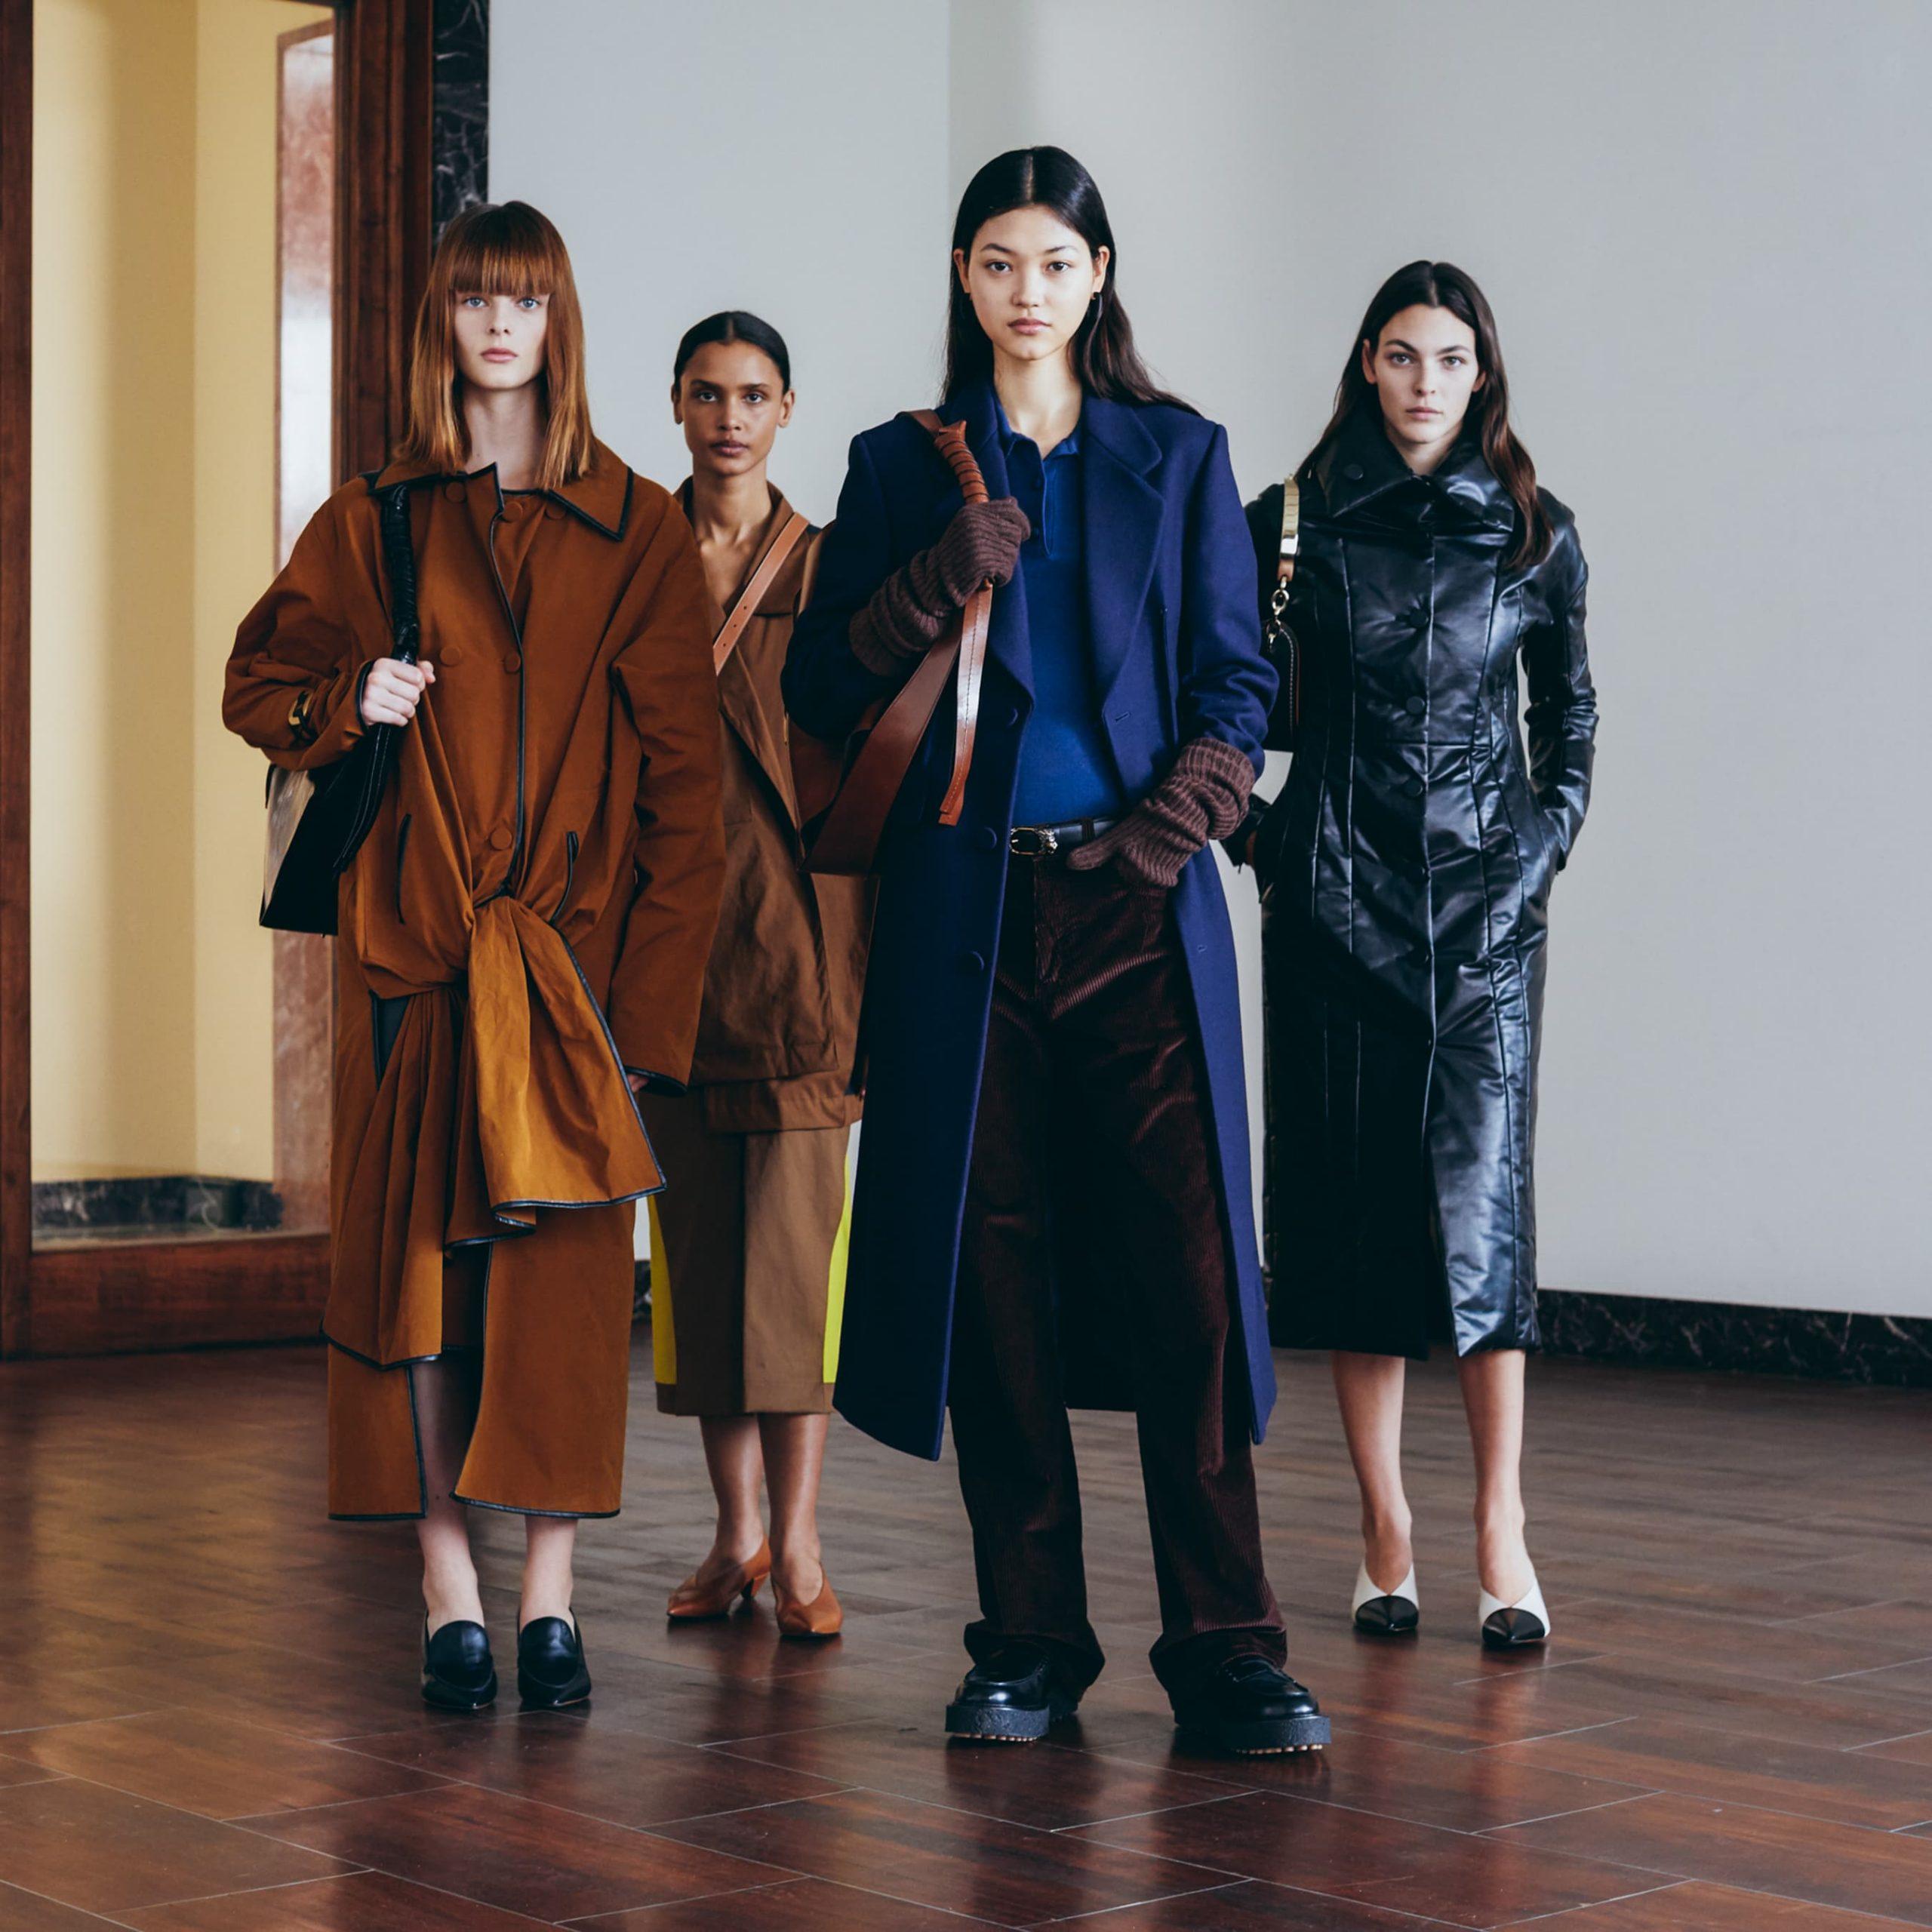 Etro, Tod's, Antonio Marras, Romeo Gigli, Marco Rambaldi, Act Nº1, & Vivetta Fall 2021 Fashion Show Review